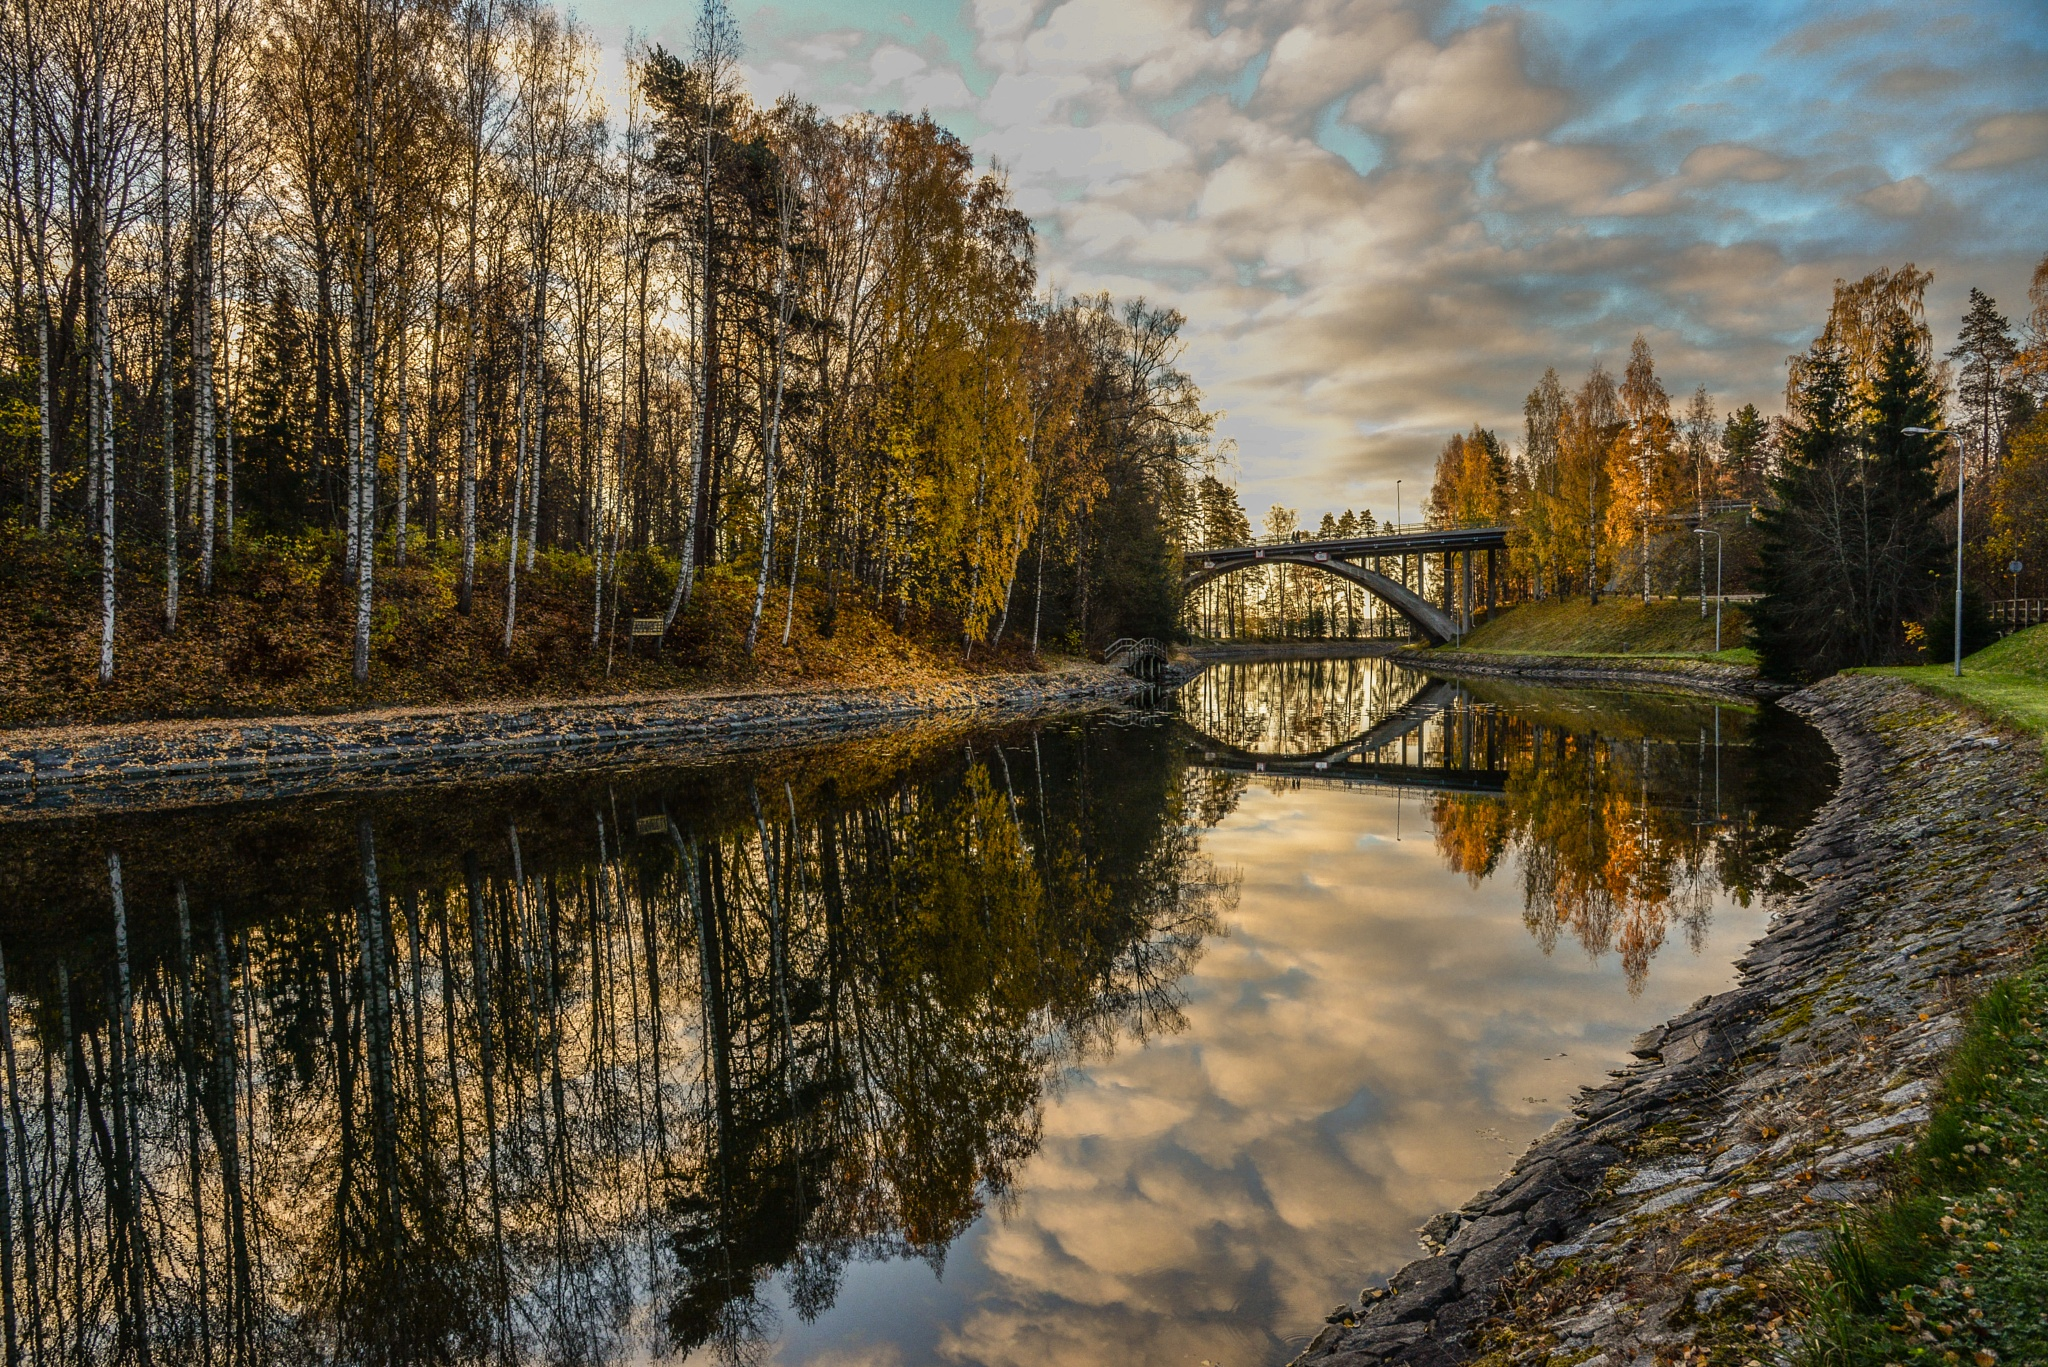 Just before sunrise by HeikkiHAtMAN PHOTOGRAPHY